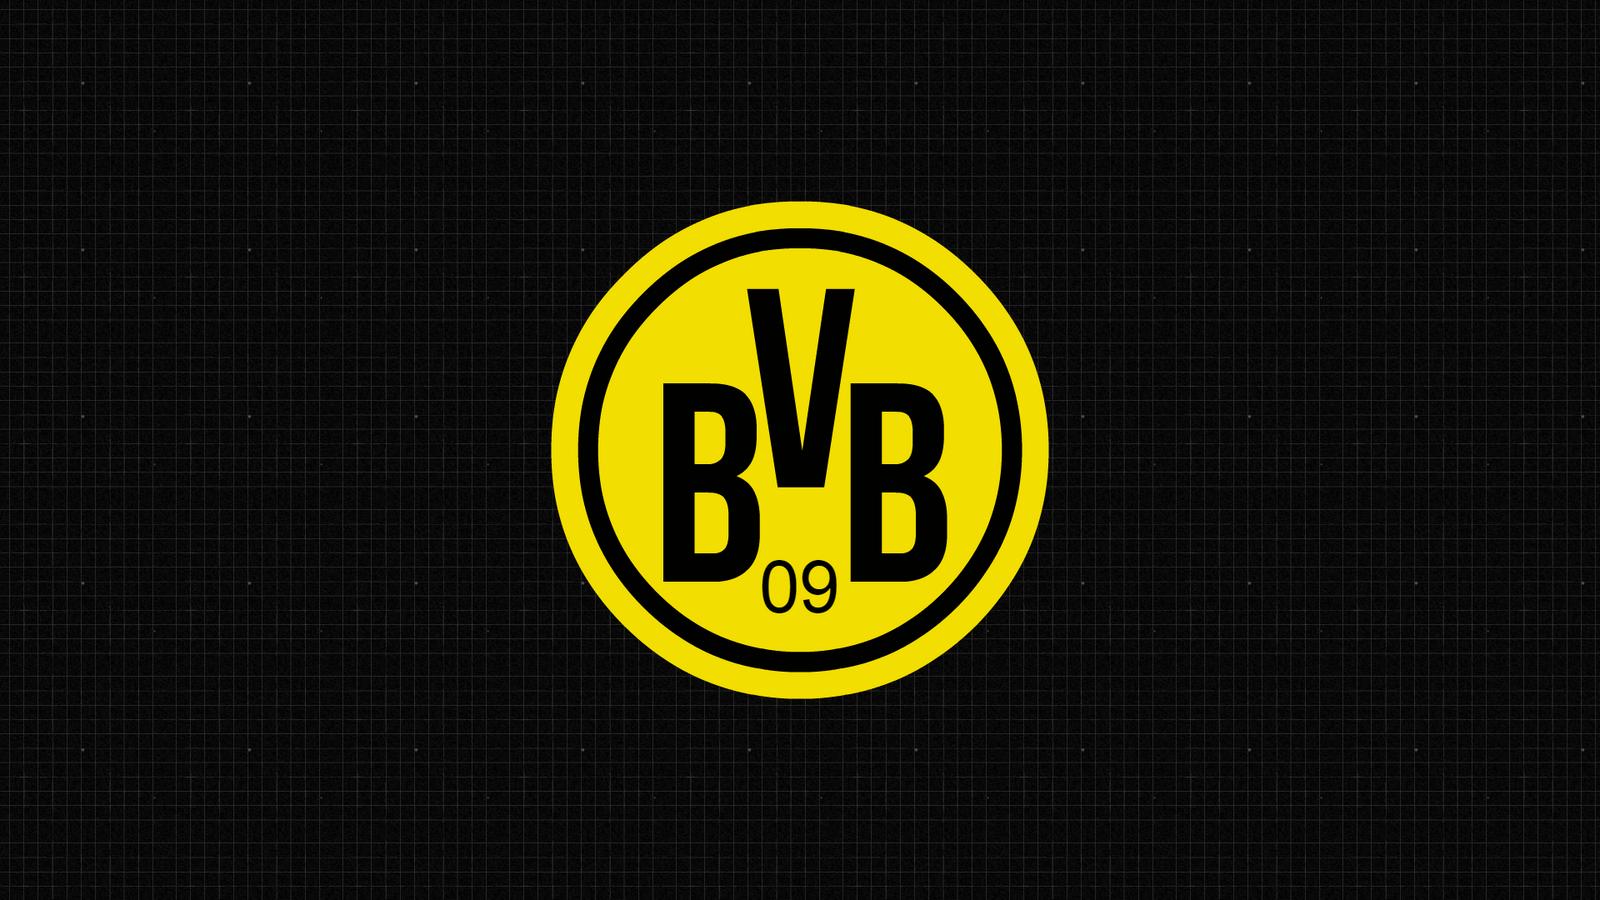 Minimalist Borussia Dortmund Wallpaper 1920x1080 By Octss On Deviantart